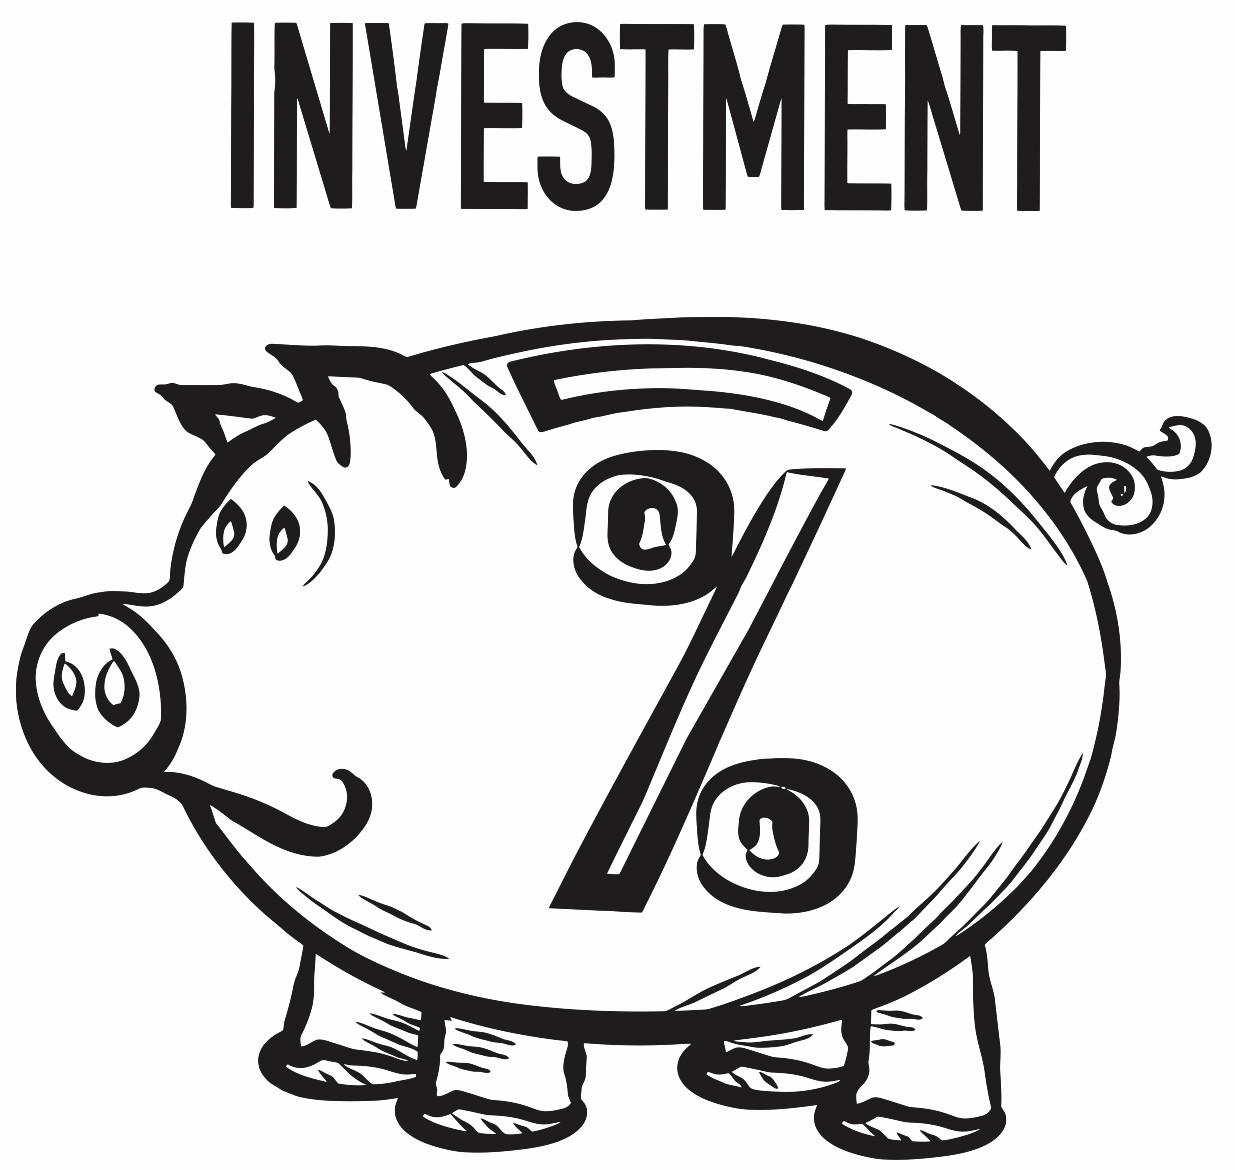 1235x1170 Cute Piggy Bank Investment Percentage Concept Printable Image